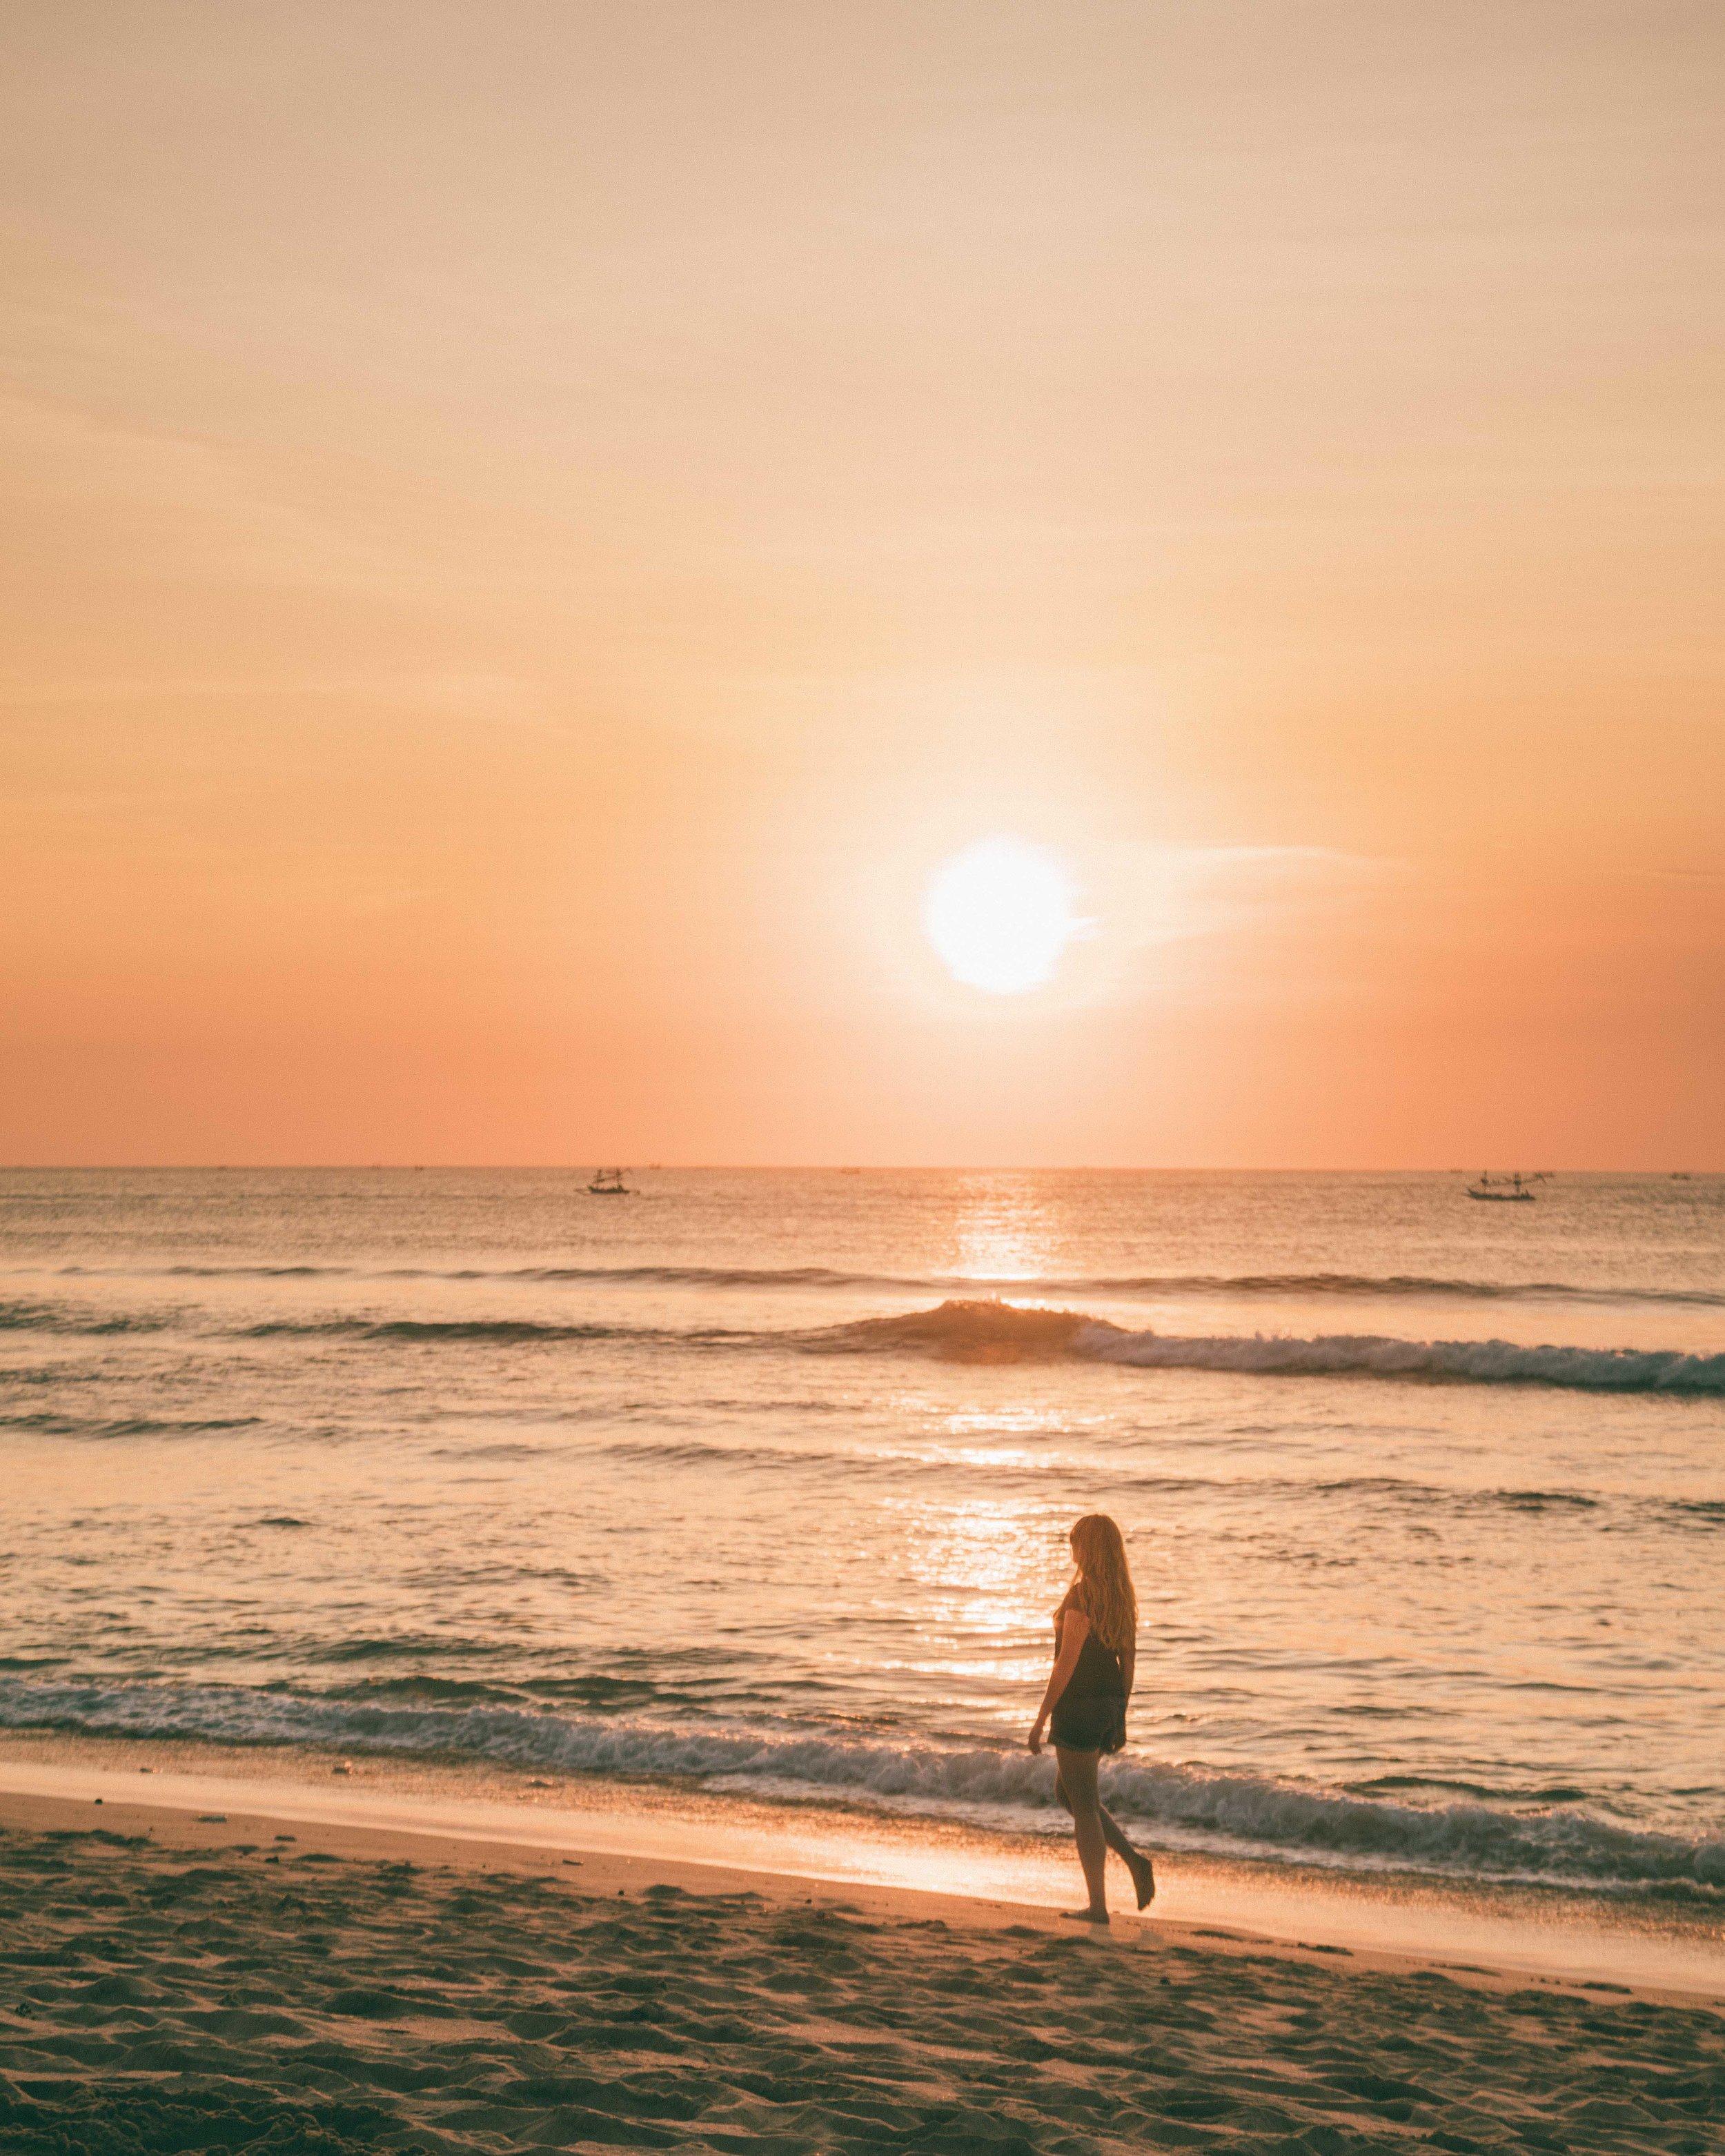 Bali Itinerary 7 days: Dreamland Beach